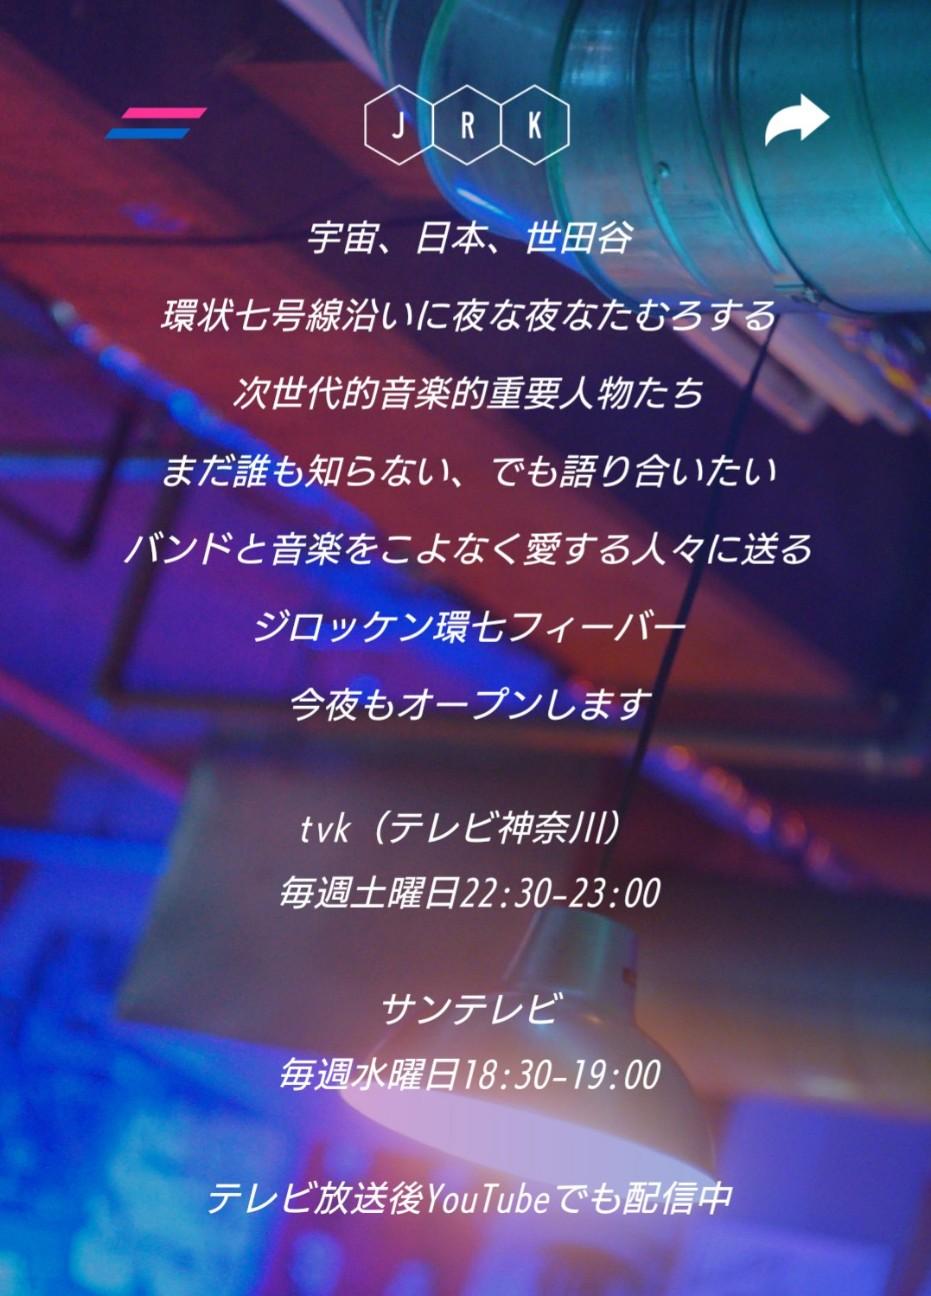 f:id:sakidoriyutsubarock:20190524001854j:plain